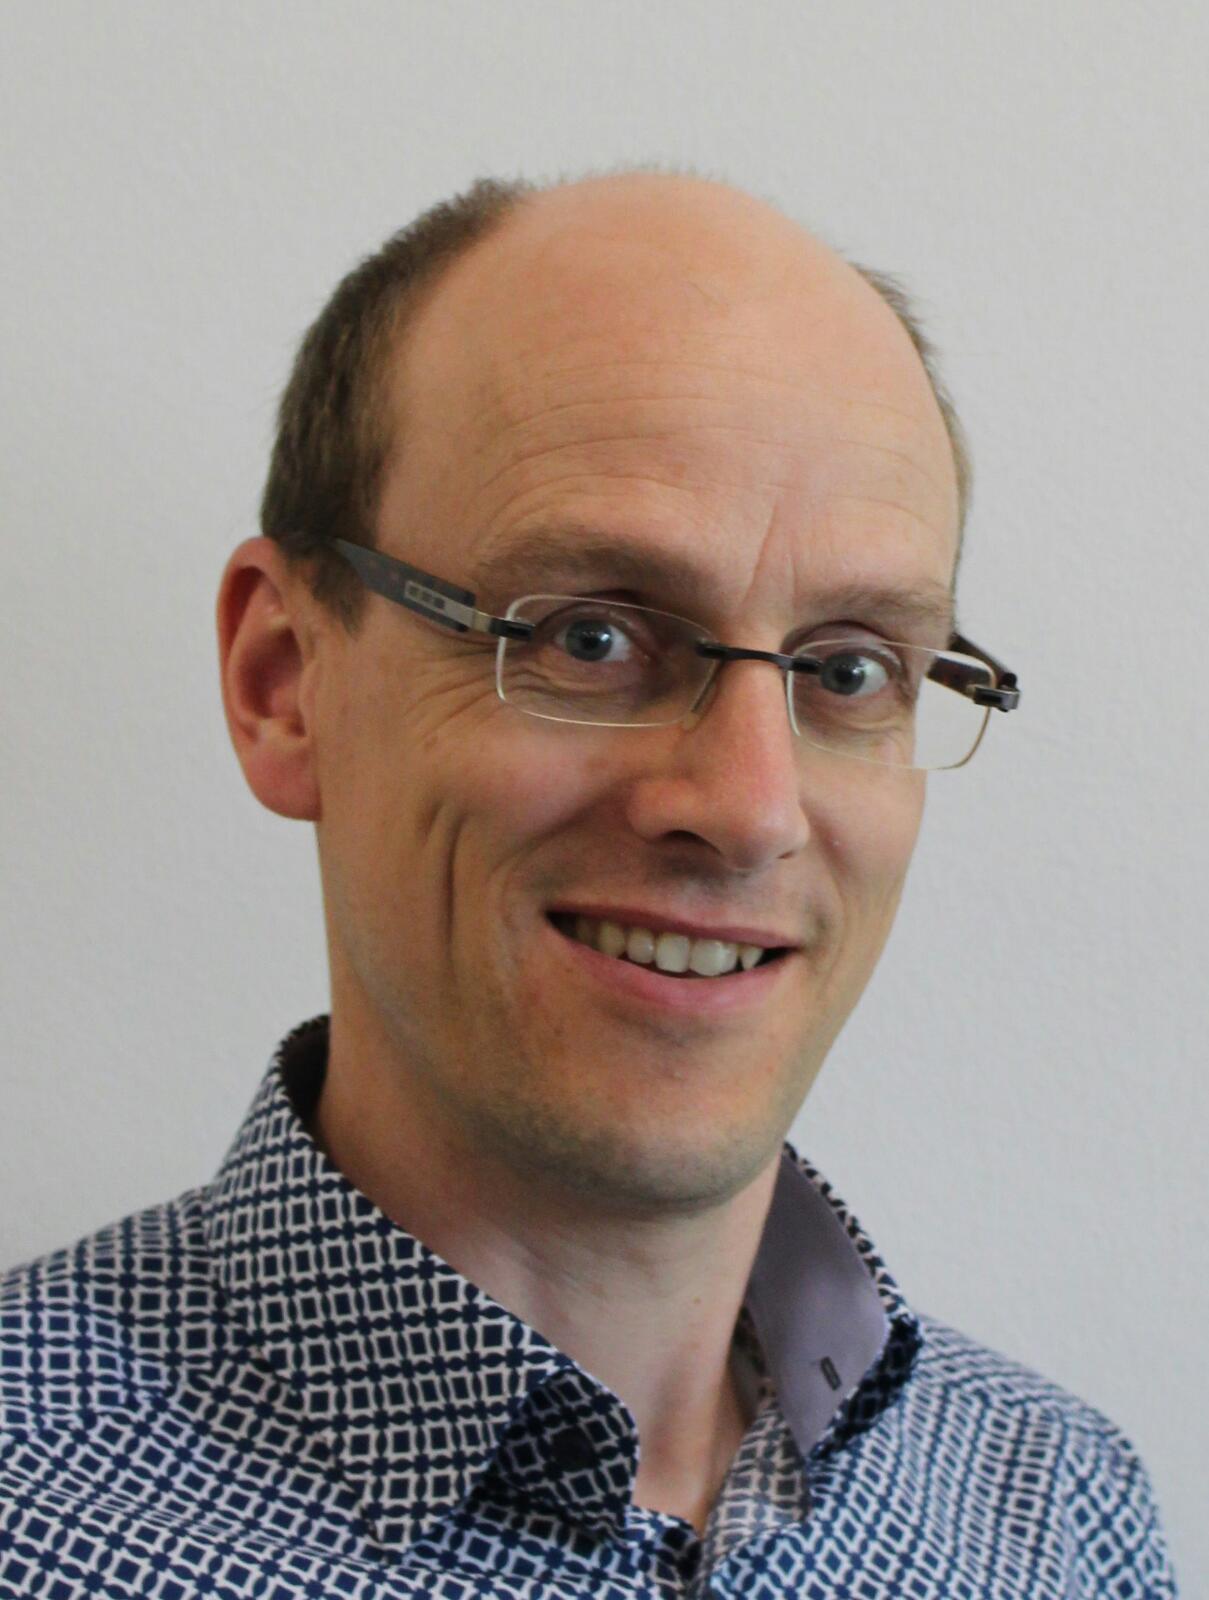 Markus Rohrmann